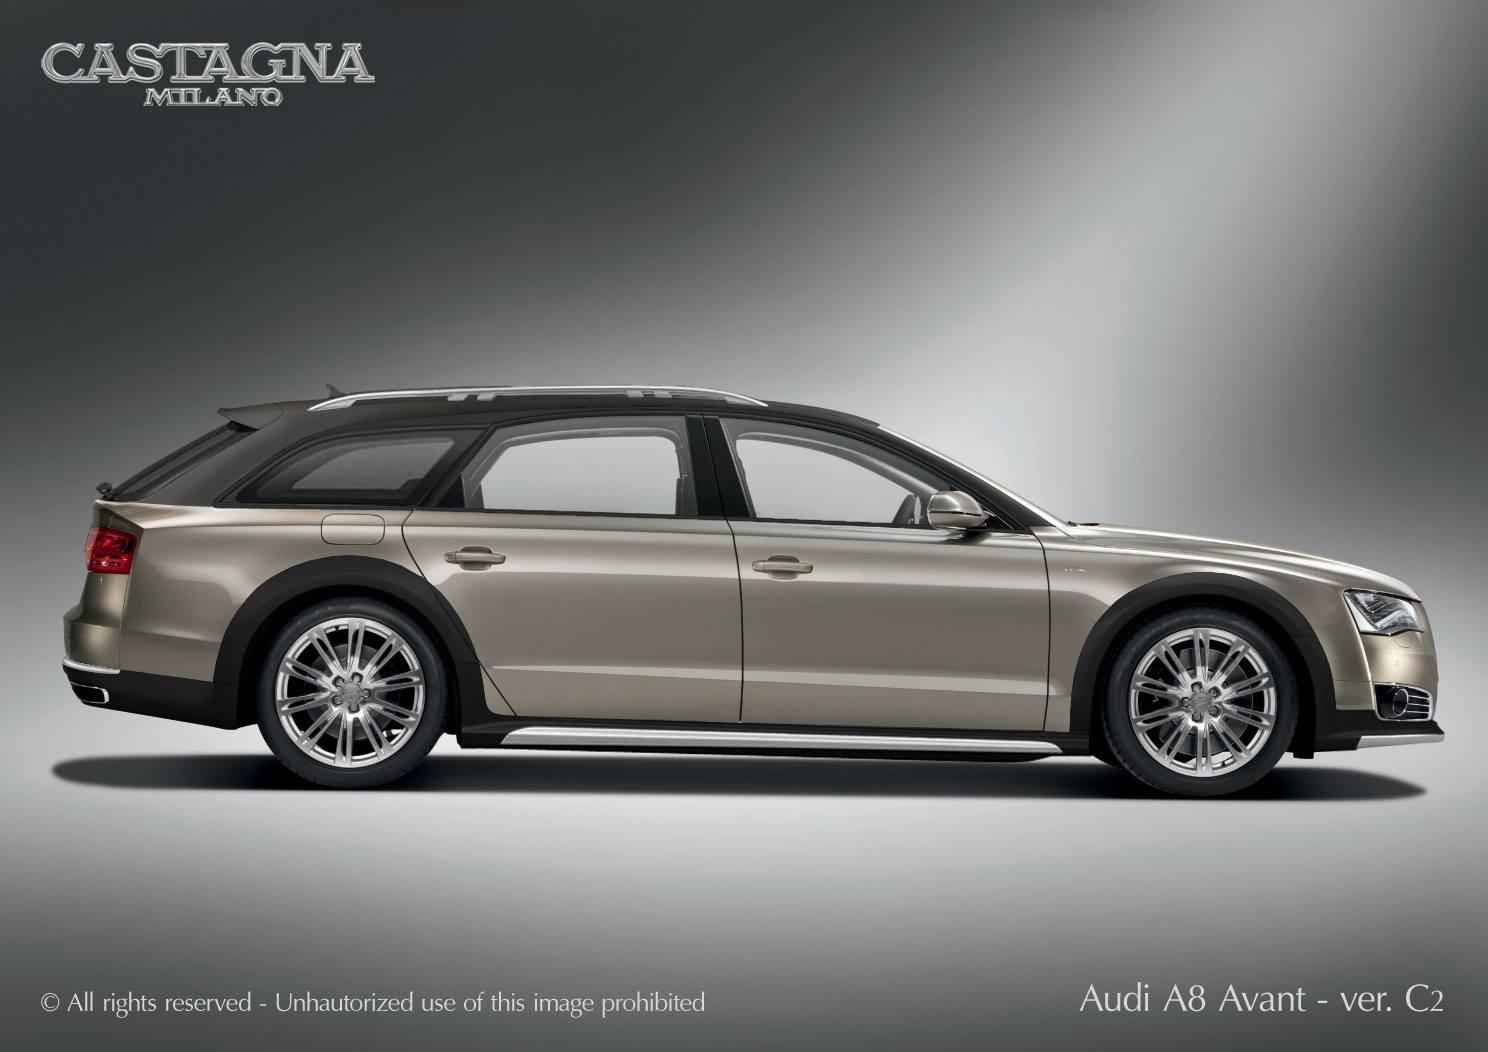 69550b02-audi-a8-wagon-by-castagna-milano-1